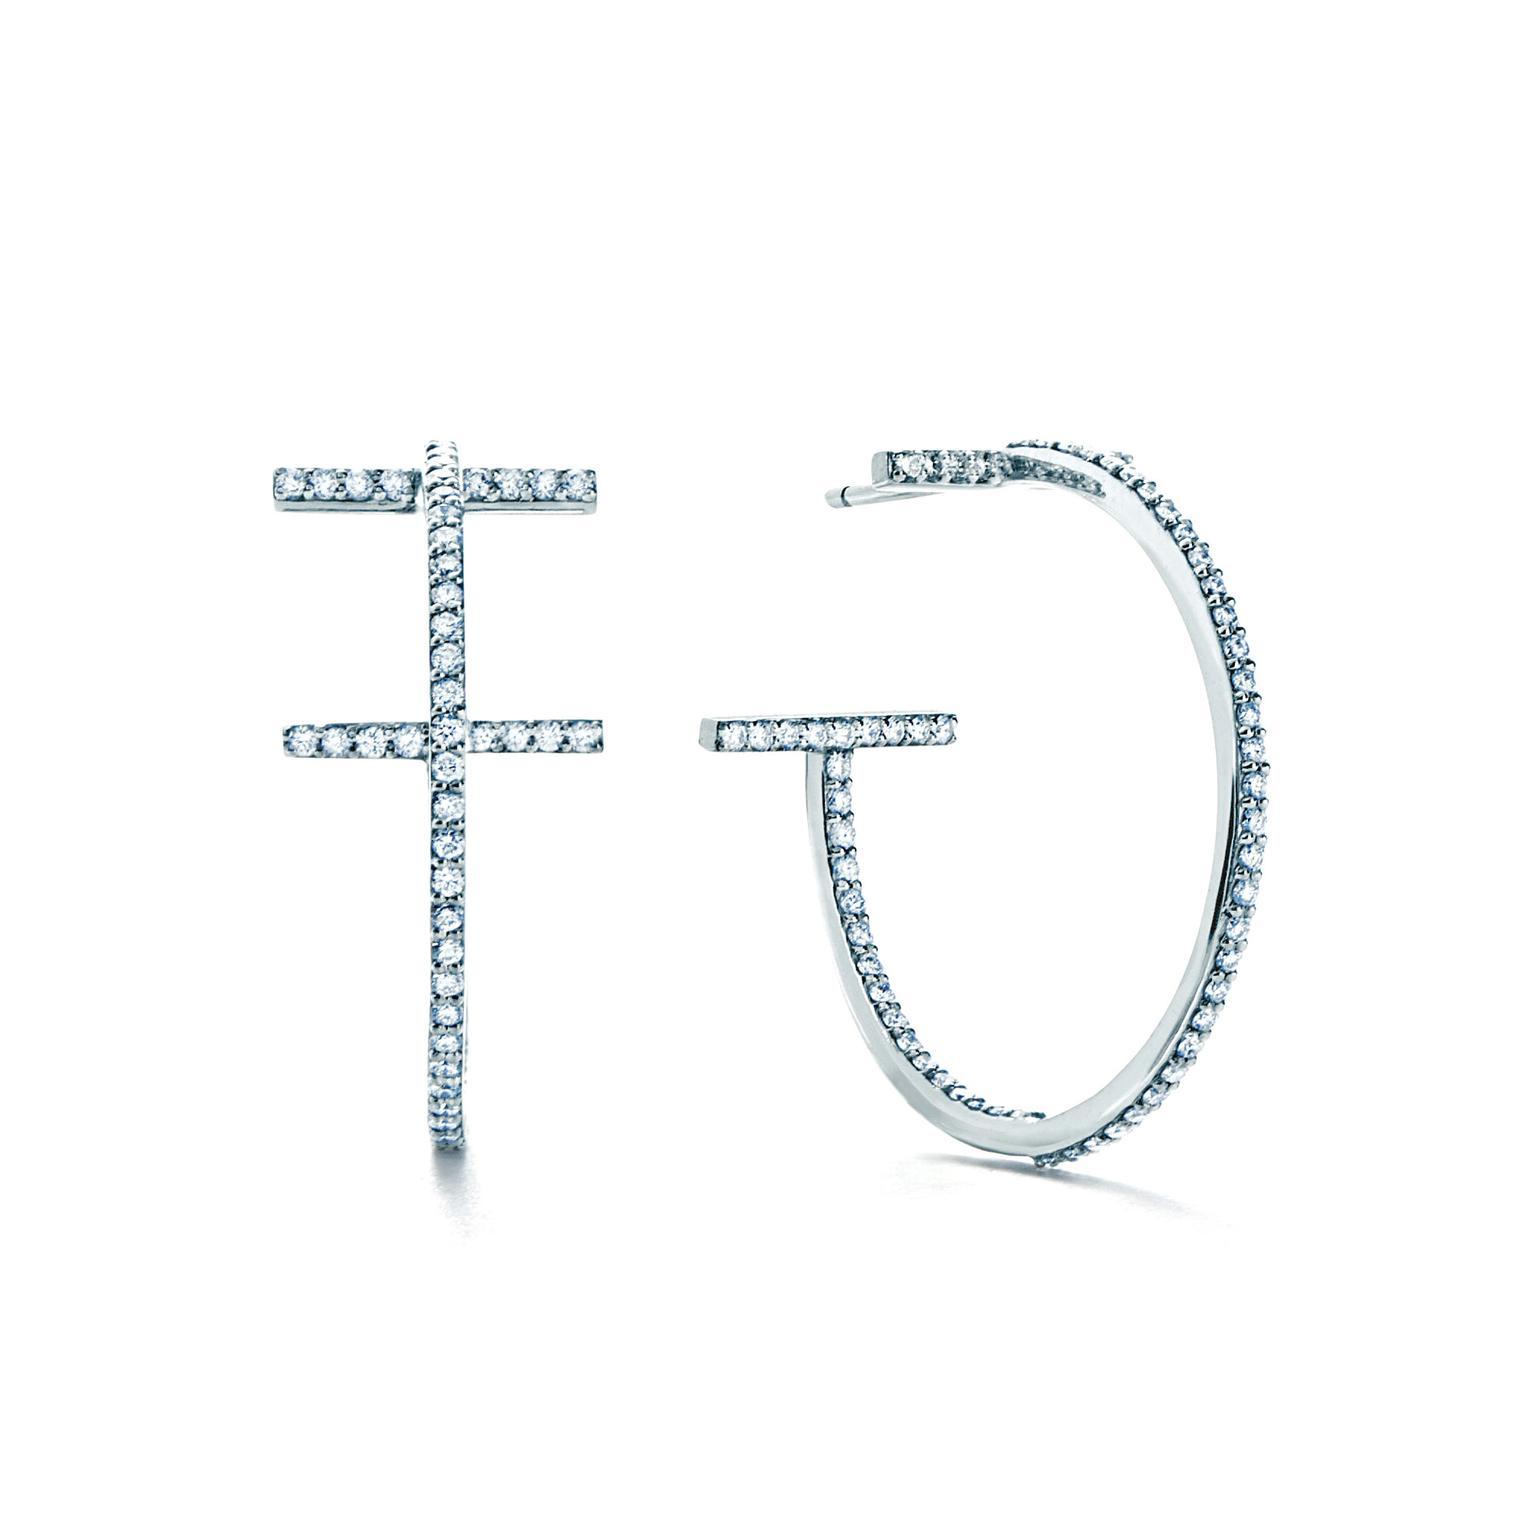 Tiffany T gold and diamond hoop earrings Tiffany & Co